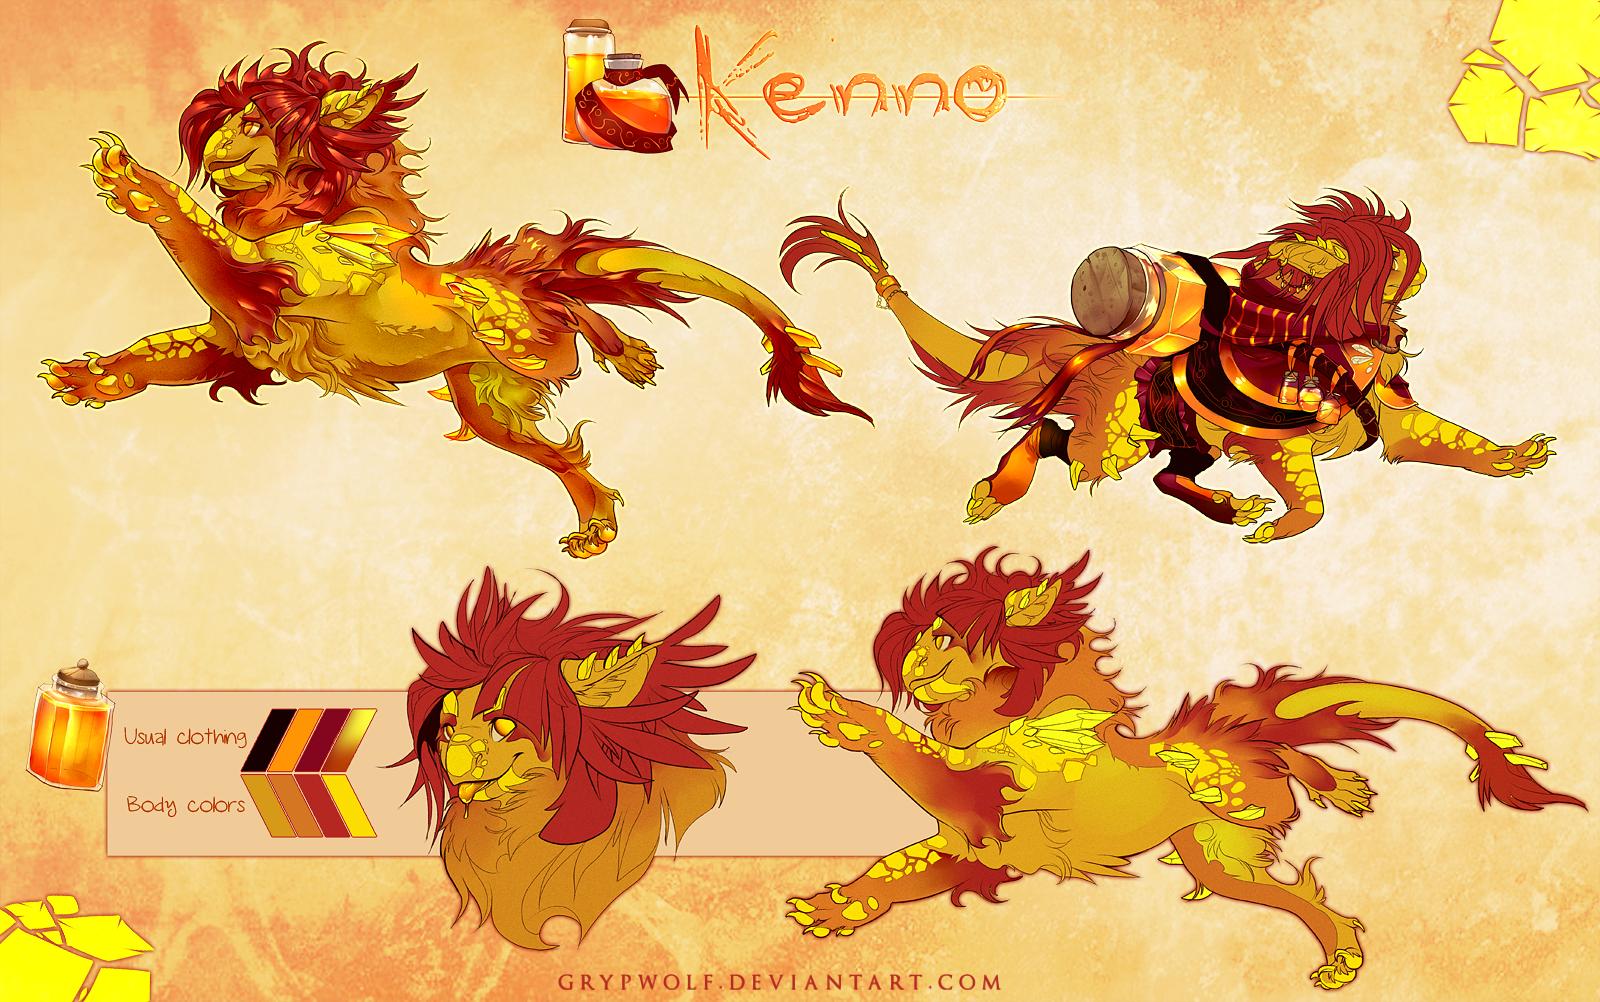 Kenno - Aetherling MYO by Grypwolf on DeviantArt